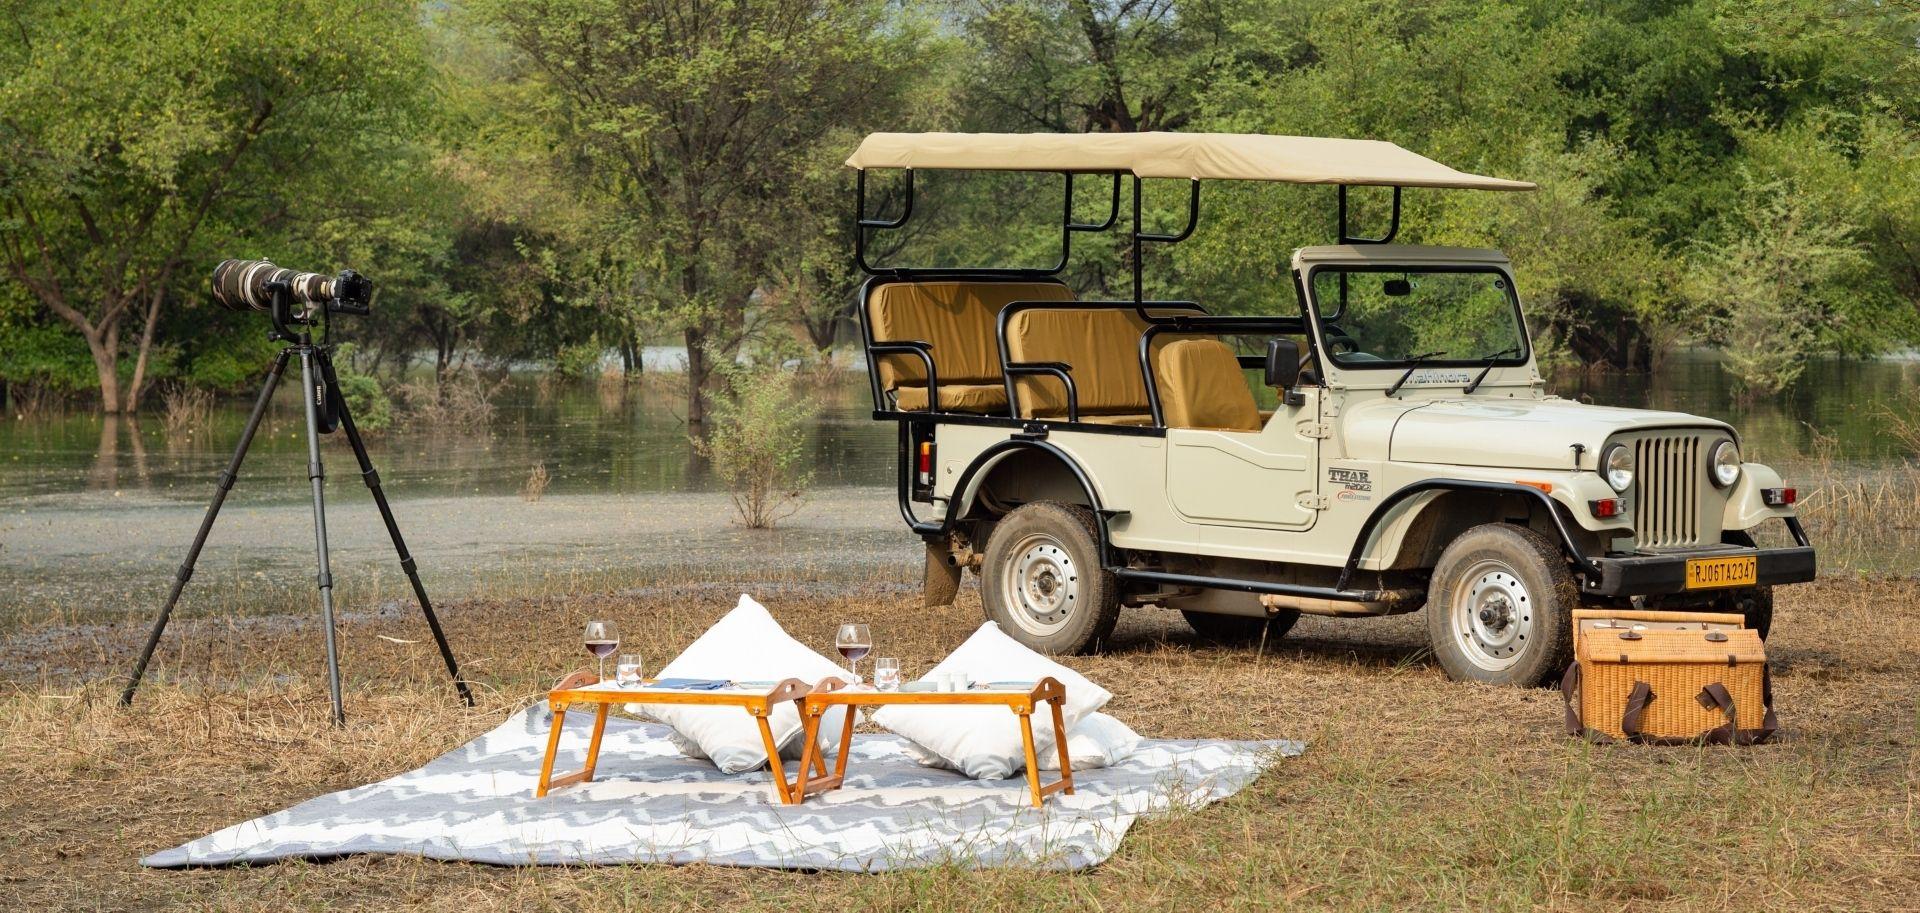 RAAS Chhatrasagar – Jeep safari